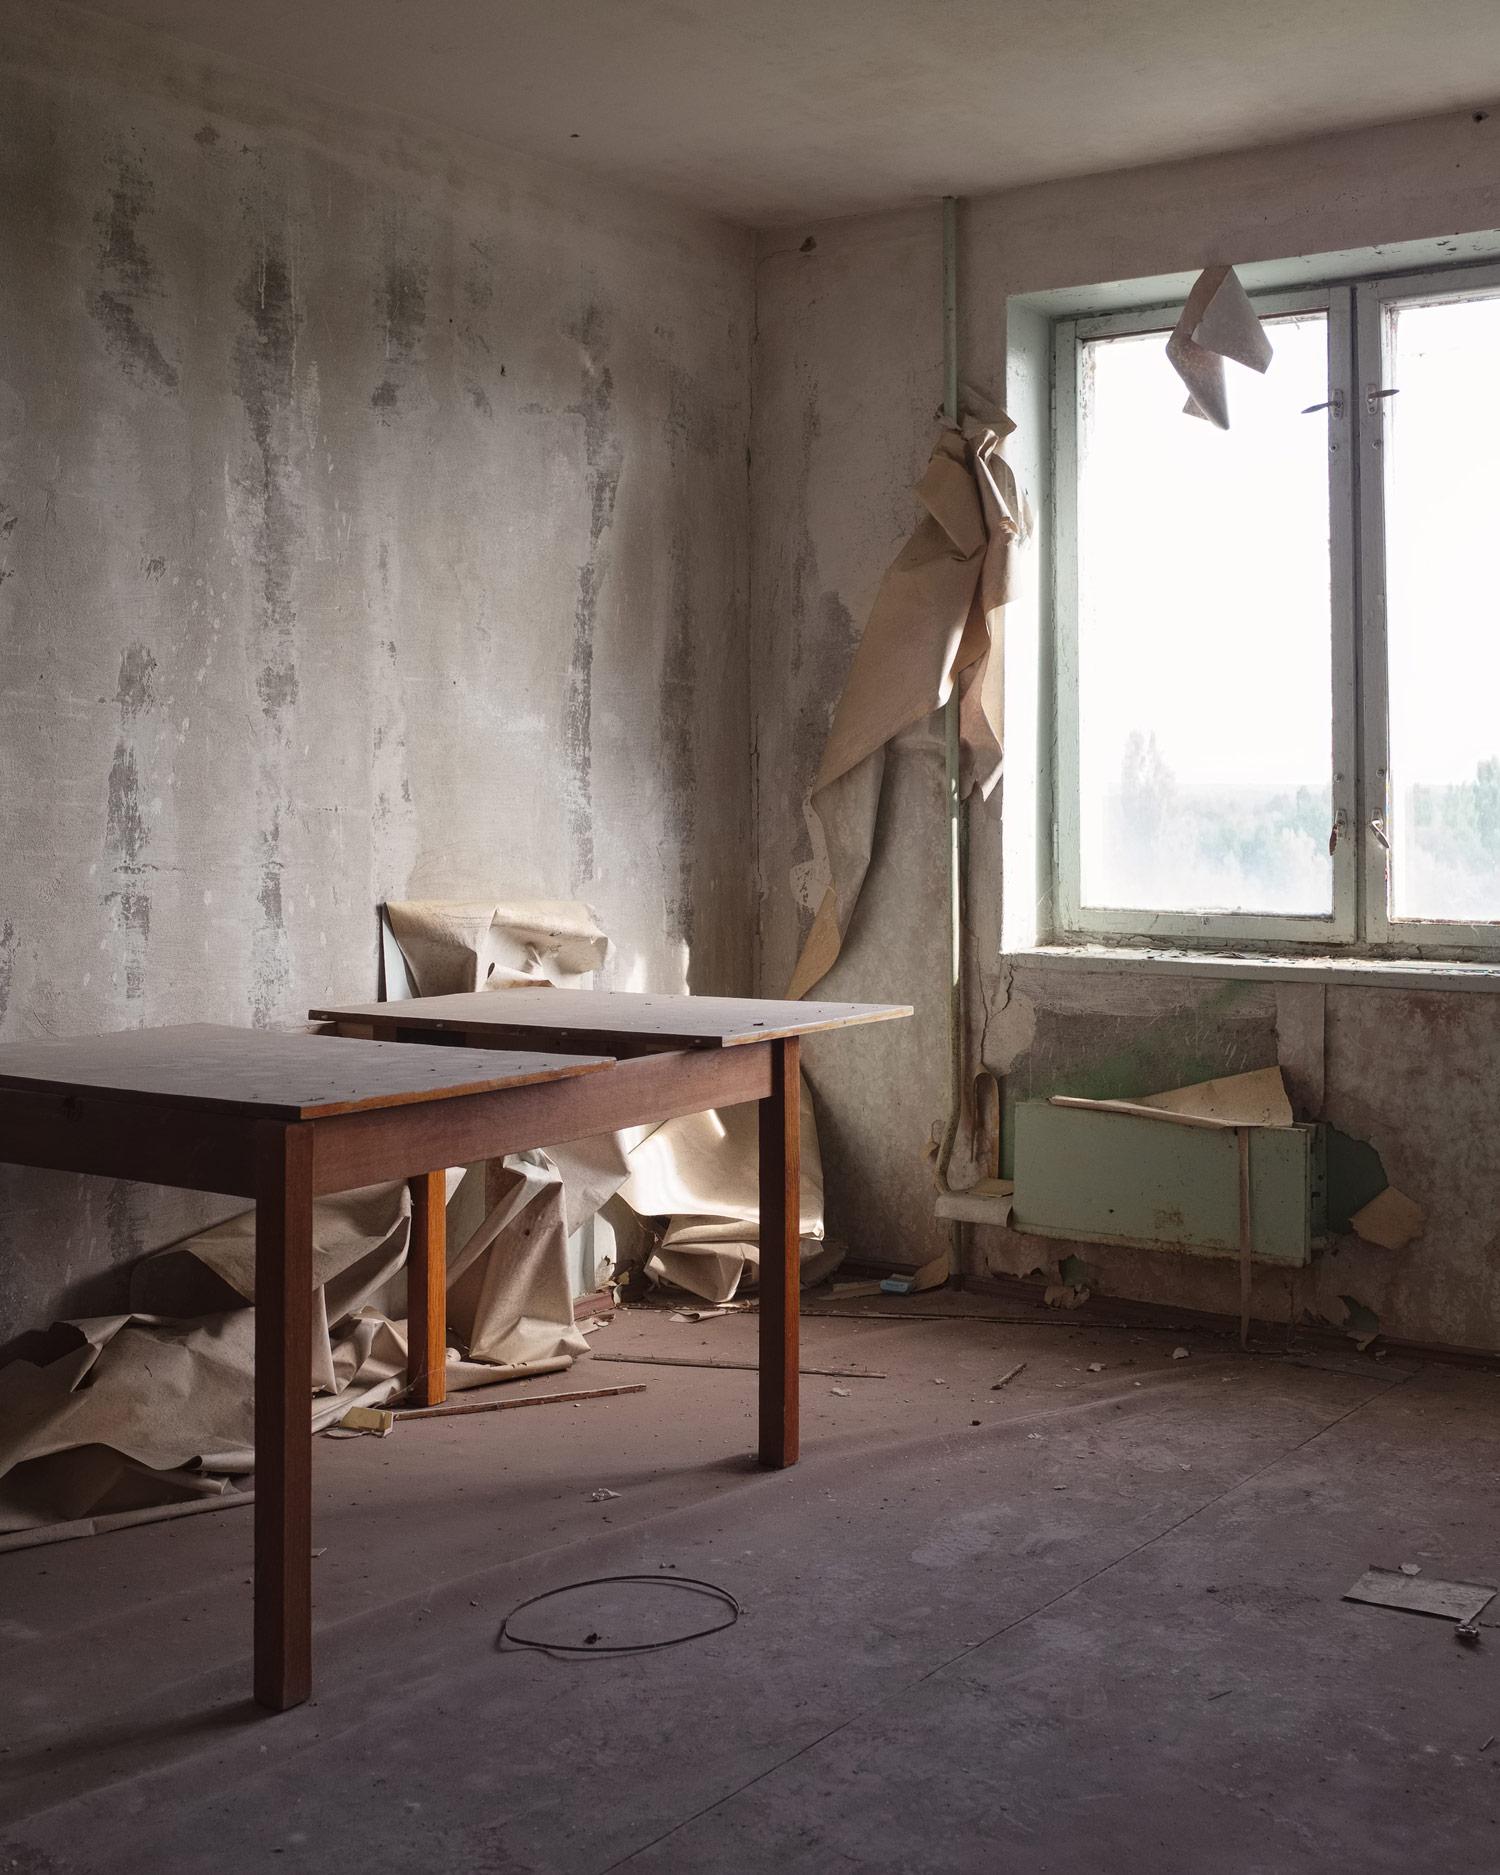 097_chernobyl_FujiyamaApartment_w.jpg